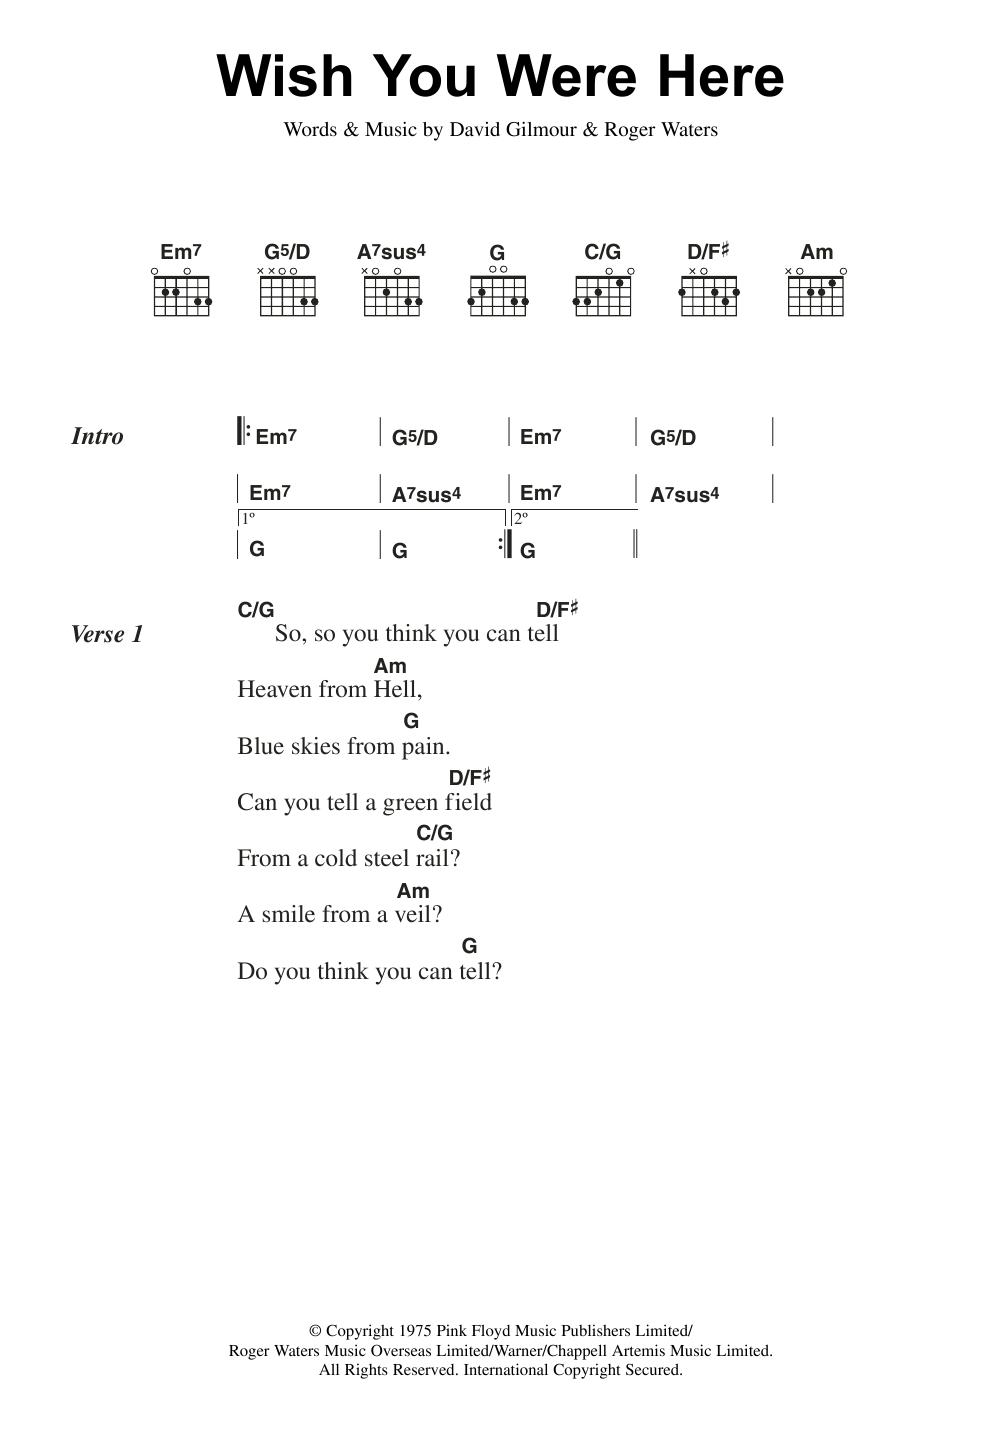 Wish You Were Here by Pink Floyd - Guitar Chords/Lyrics - Guitar Instructor